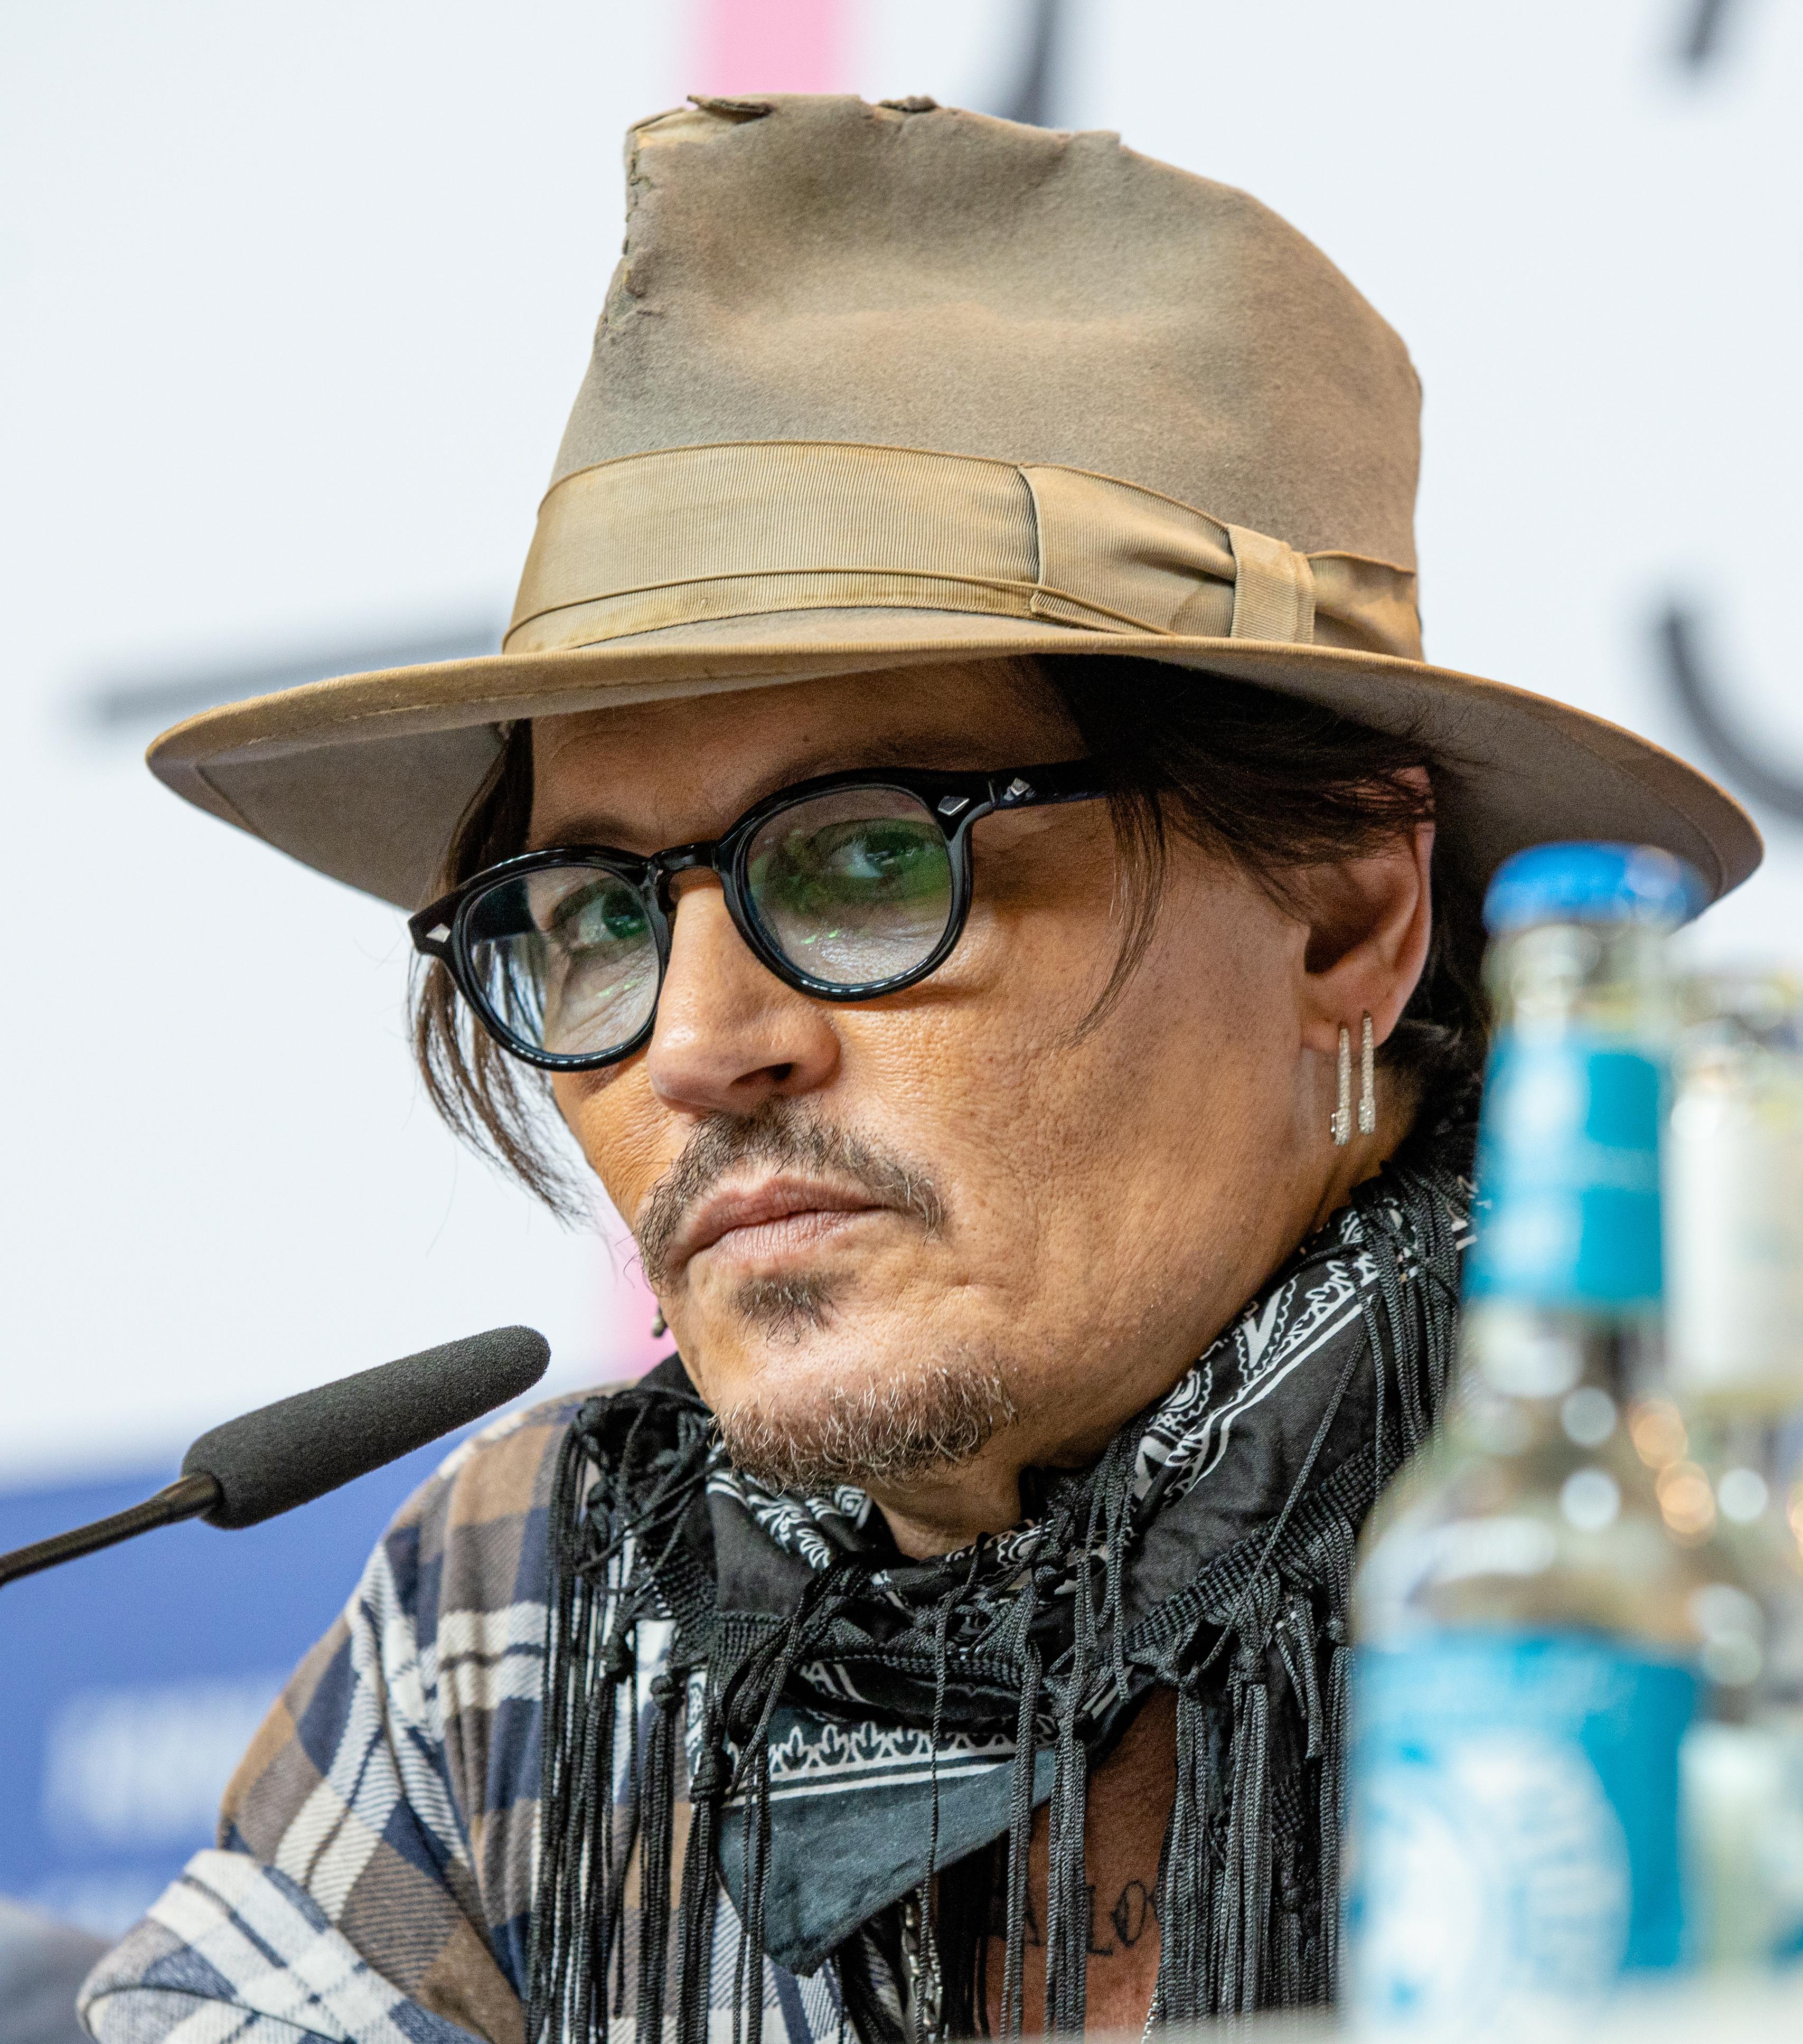 Johnny Depp - Wikipedia